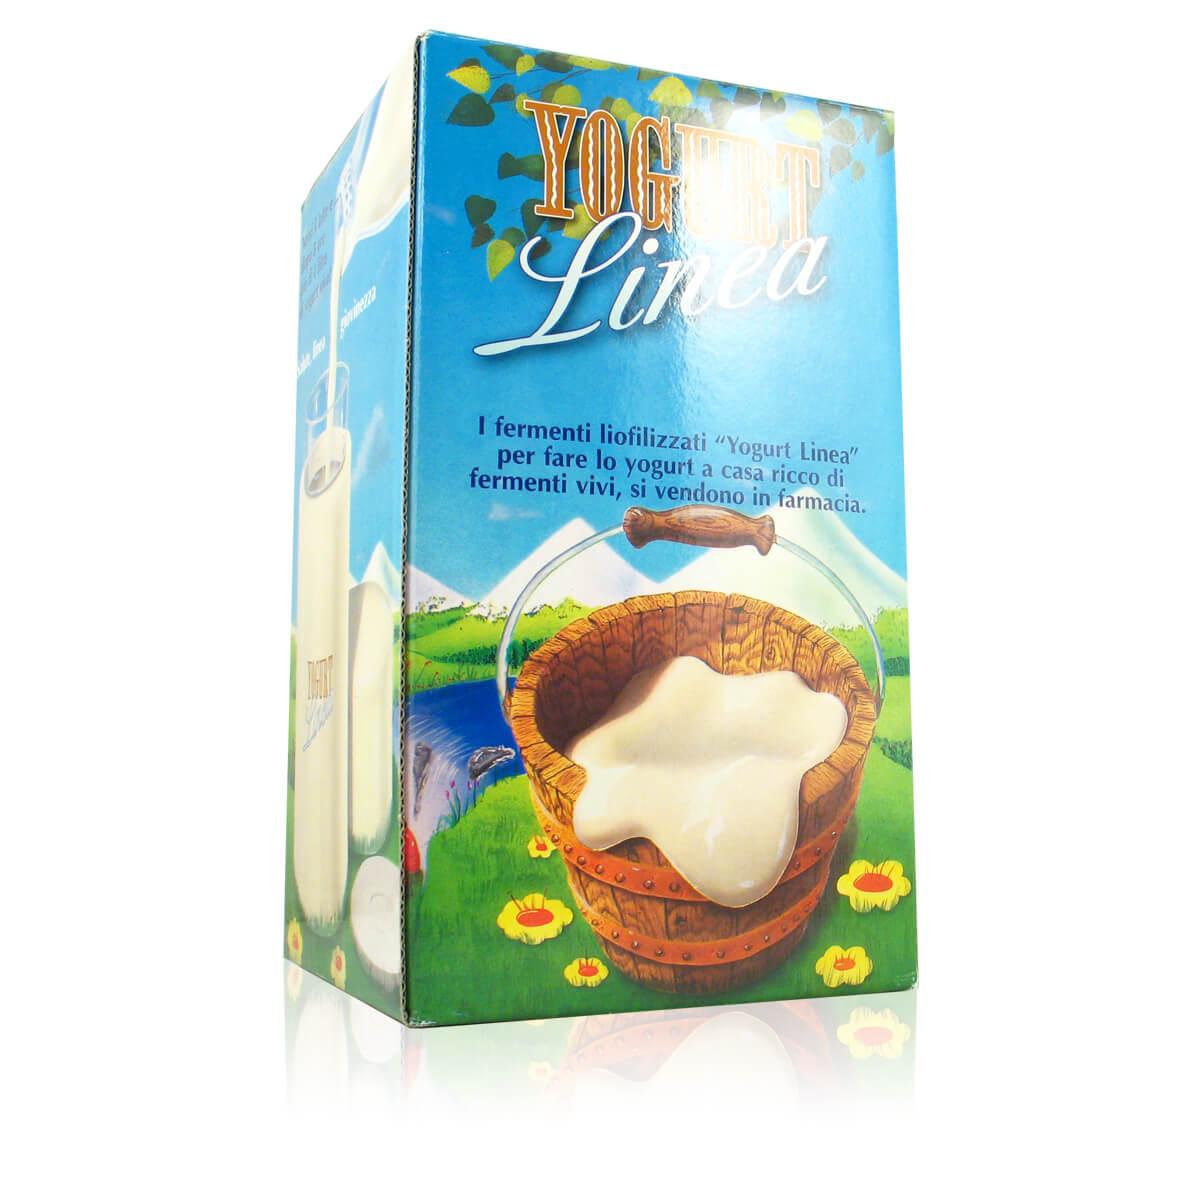 Yogurt Linea Yogurtiera